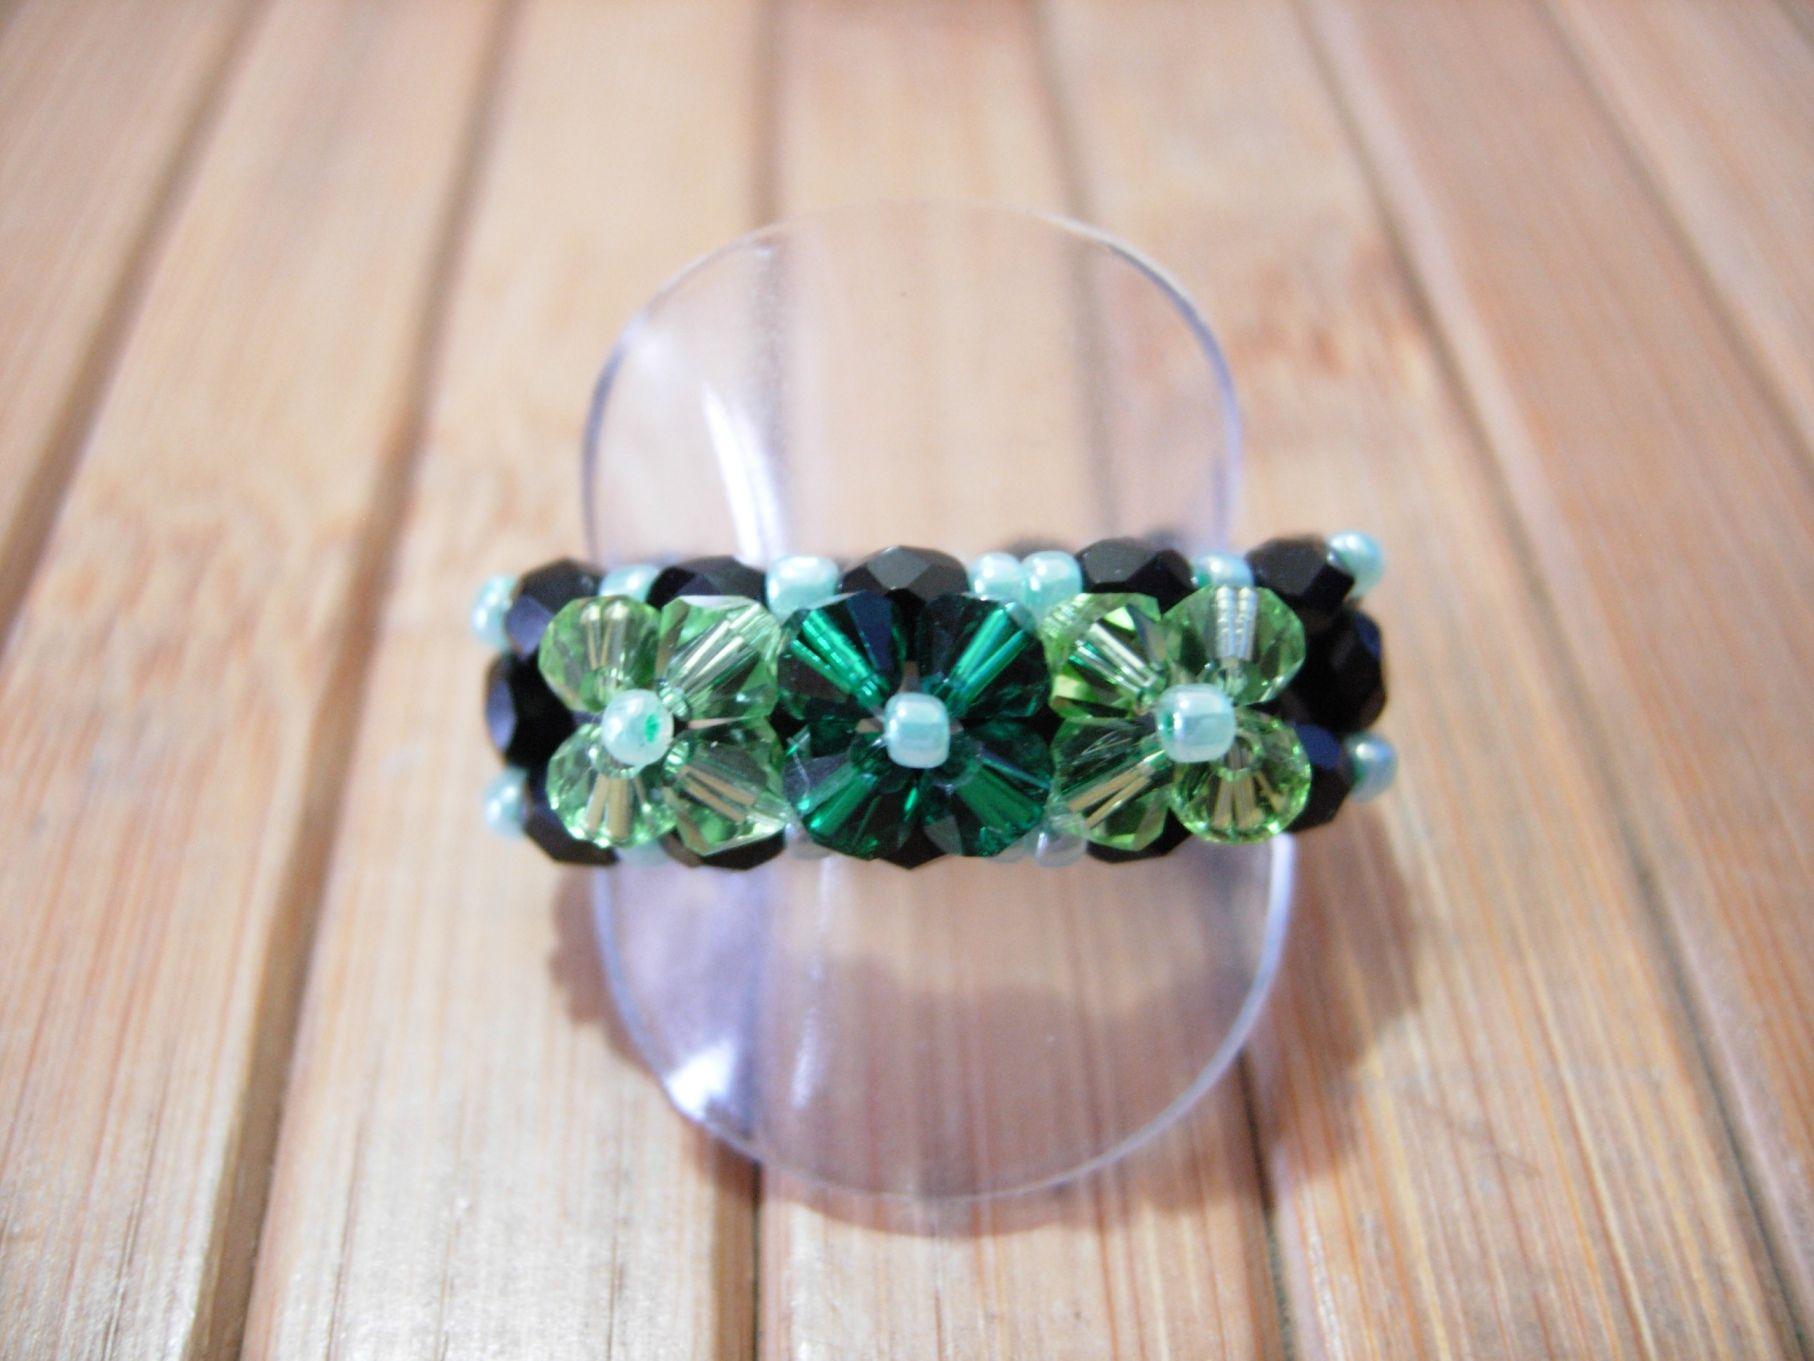 eb30bd680b08 Anillo tres flores con facetadas de base y Swarovski en dos tonos de verde  para las flores.